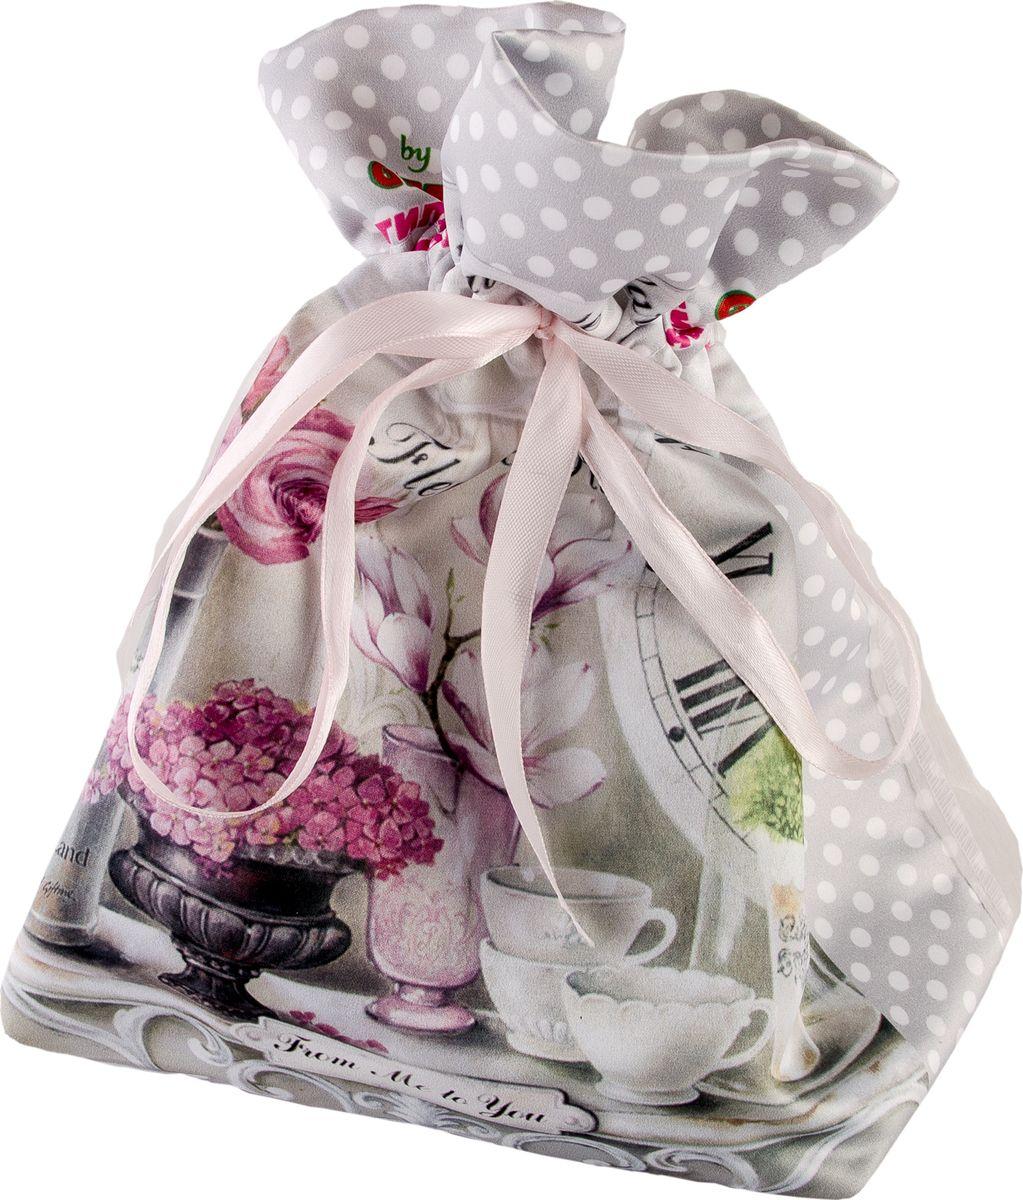 Мешочек подарочный Gift'n'Home Парижские цветы, 15 х 18 см бра 29 x 18 х 25 см